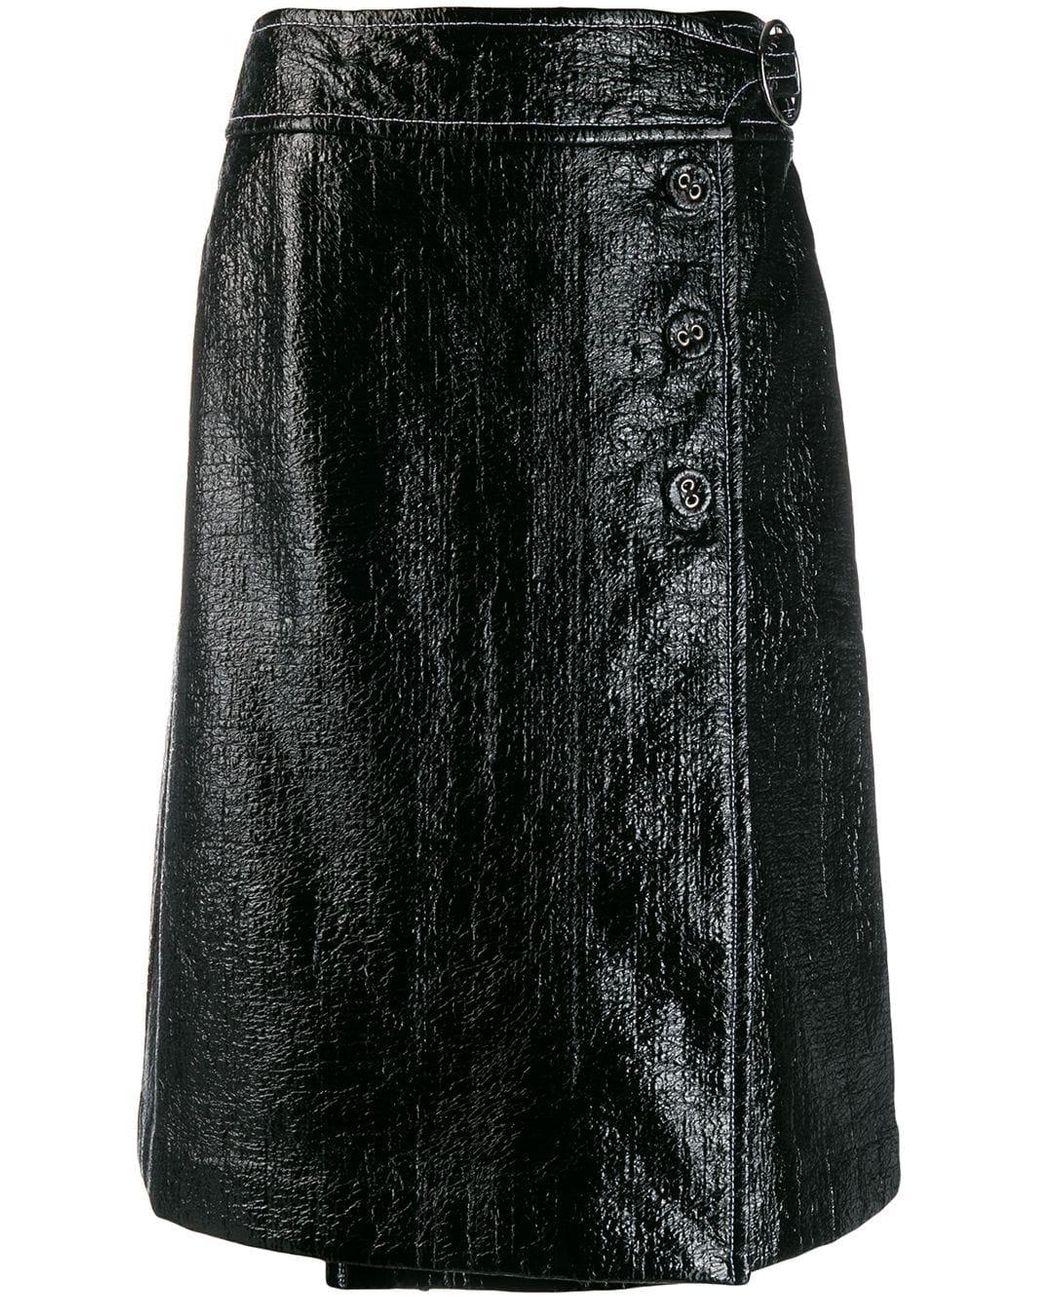 Black Tartan Check Rockabilly Vintage 50/'s Retro Pencil Skirt Banned Apparel